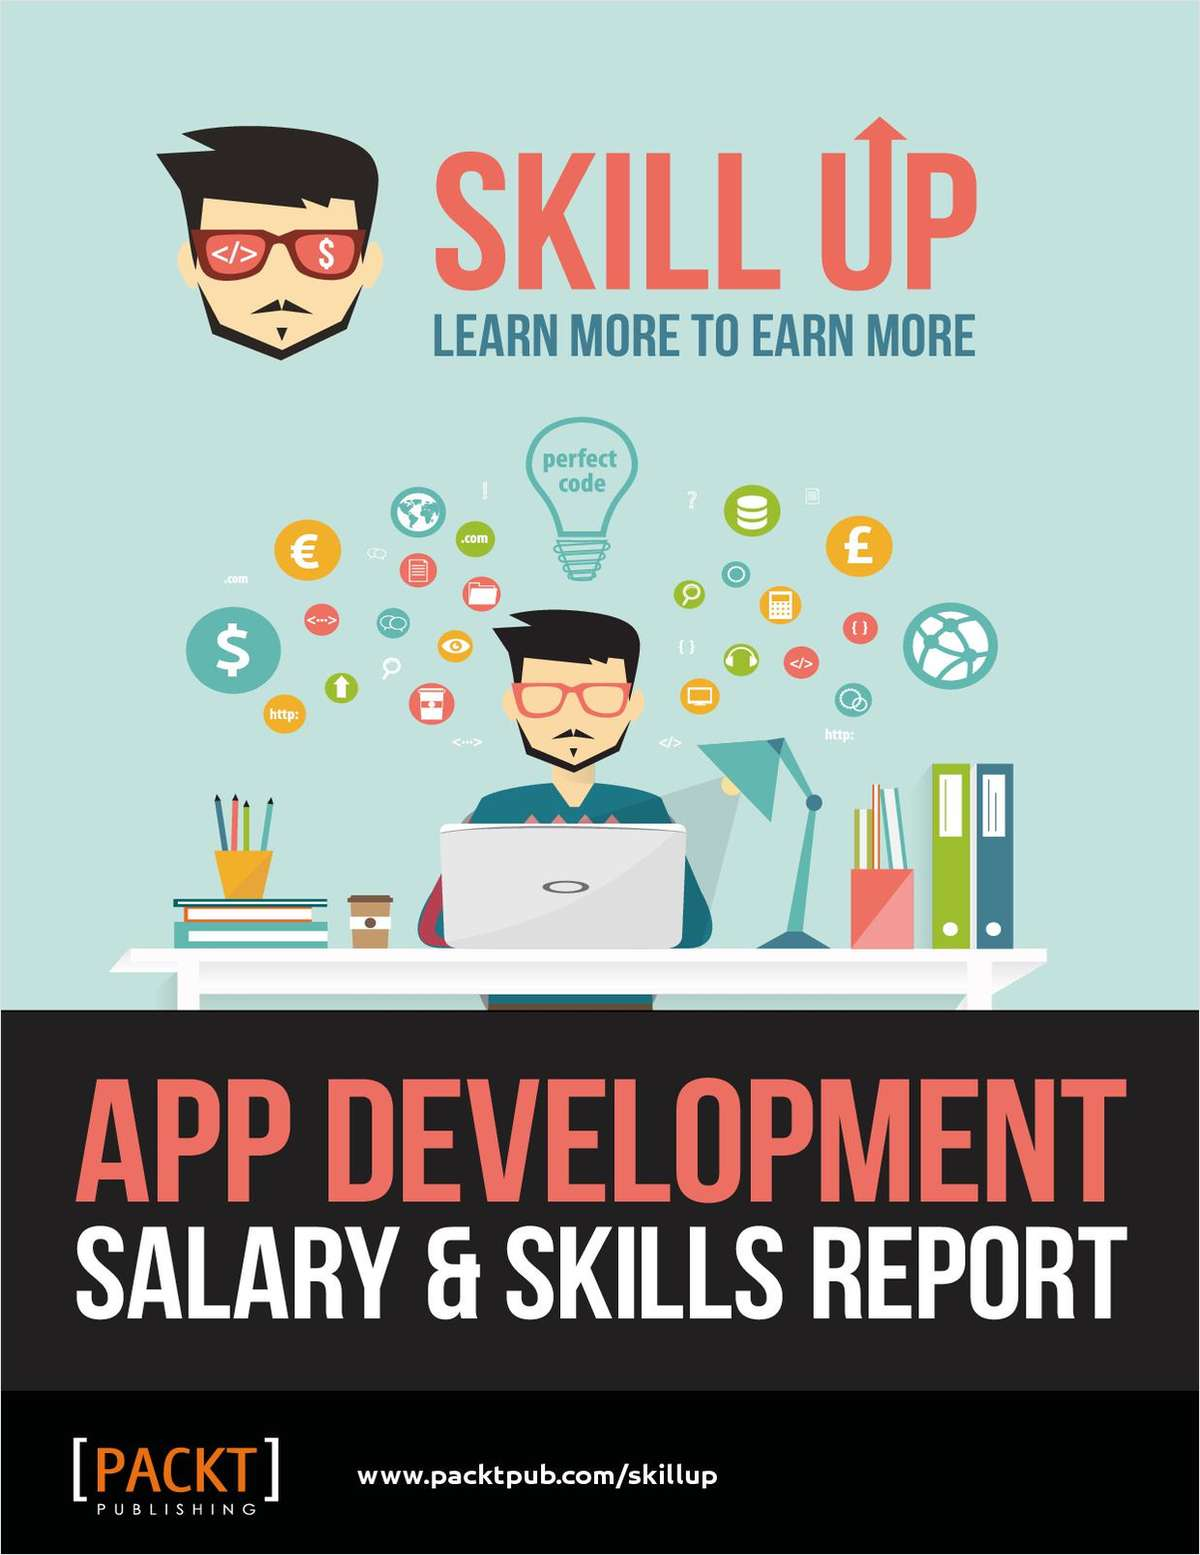 App Development - Salary & Skills Report